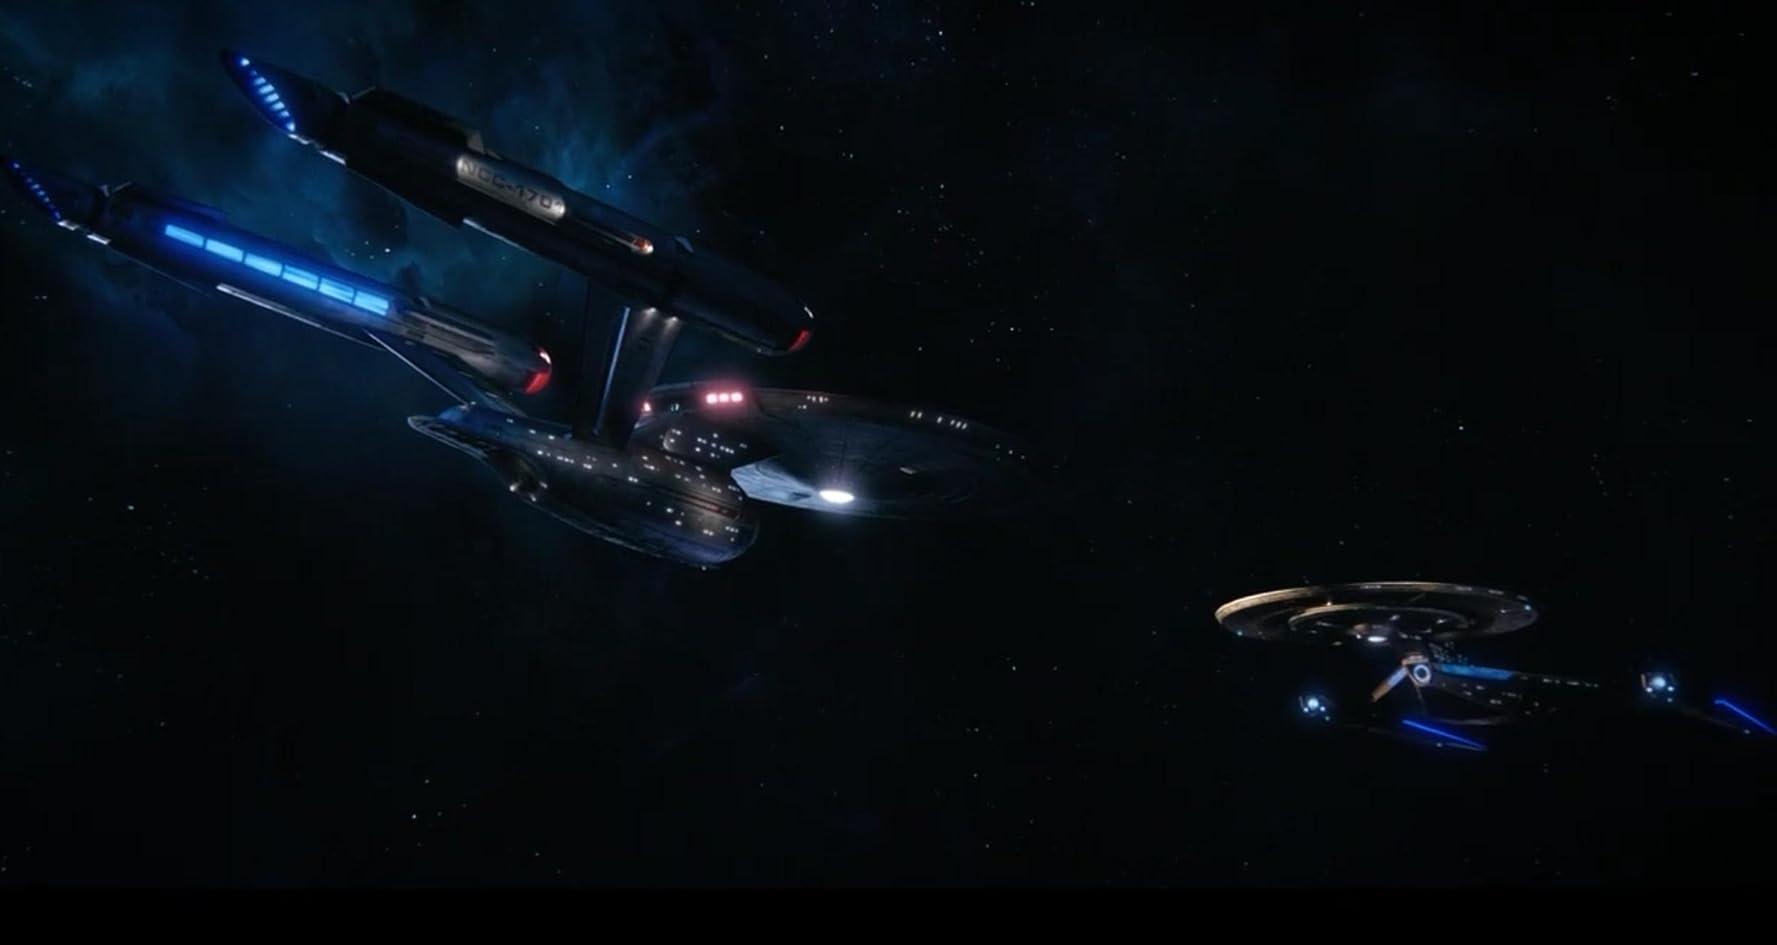 Star Trek: Discovery (2017)